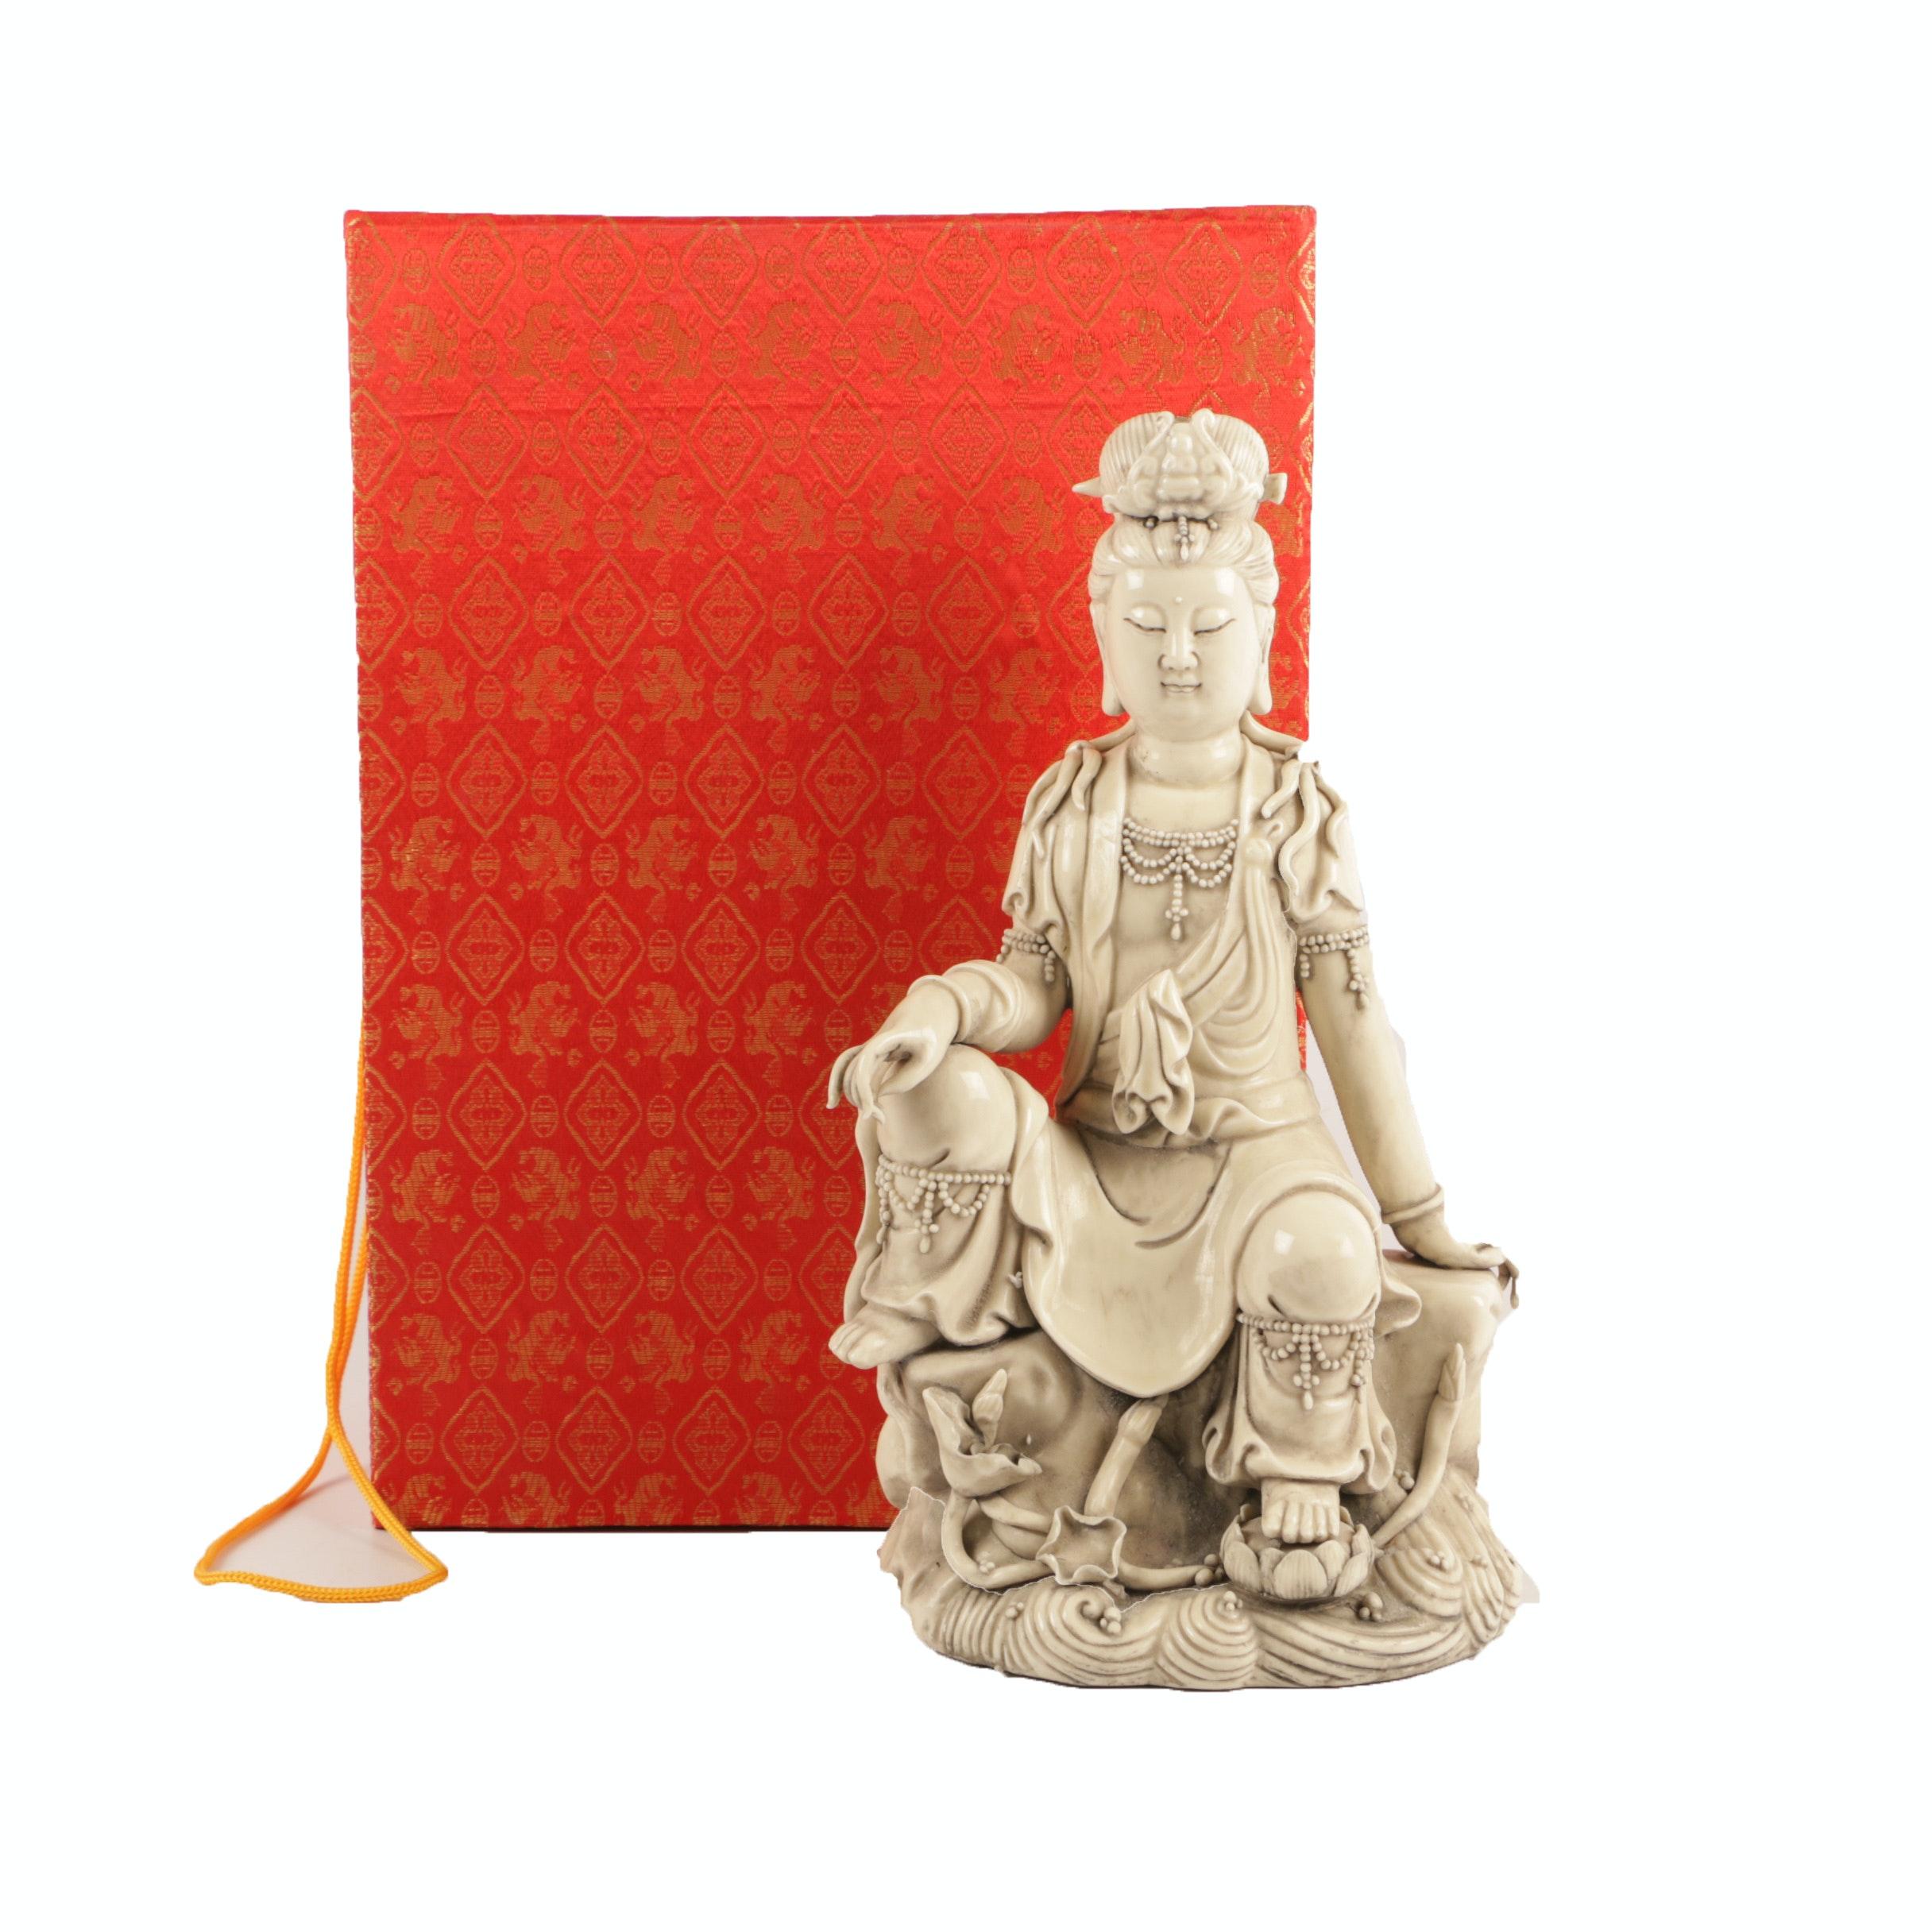 Chinese Guanyin Ceramic Figurine